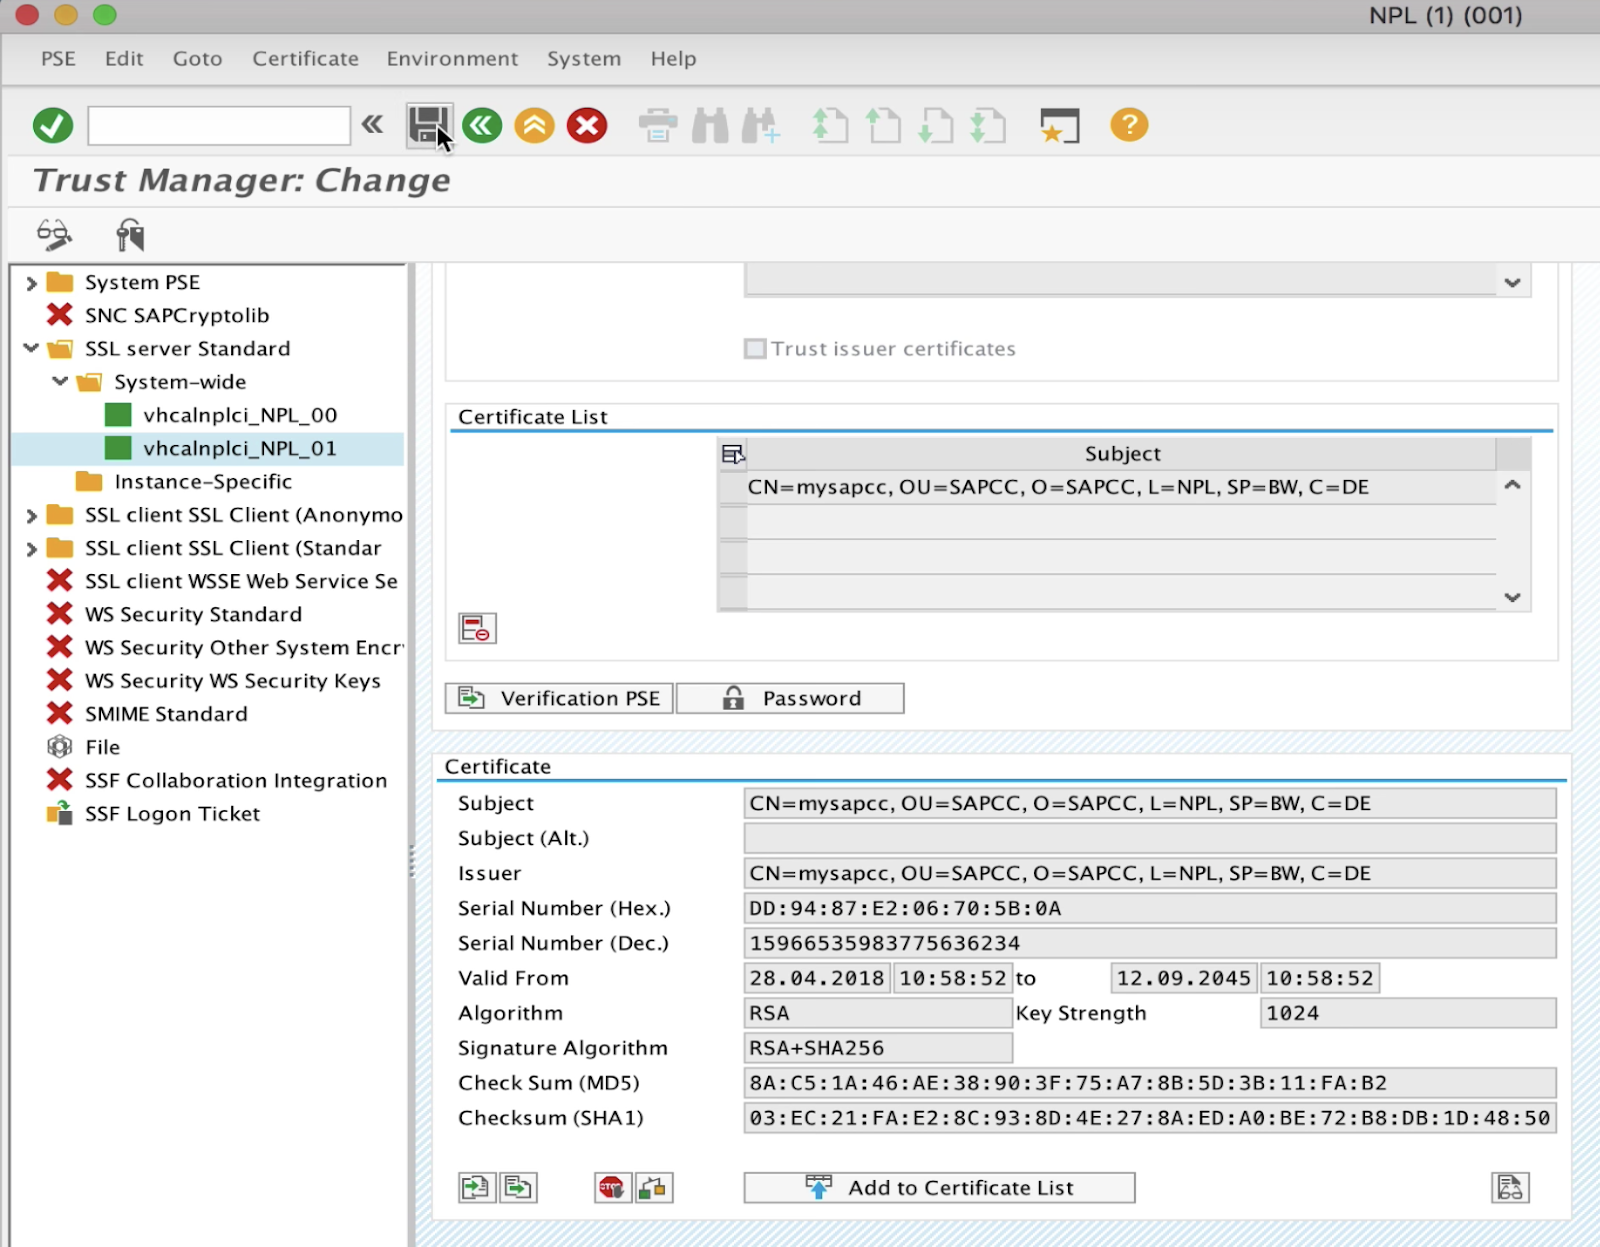 SAP ABAP Central: Configure SAPCC + NW ABAP for Principal